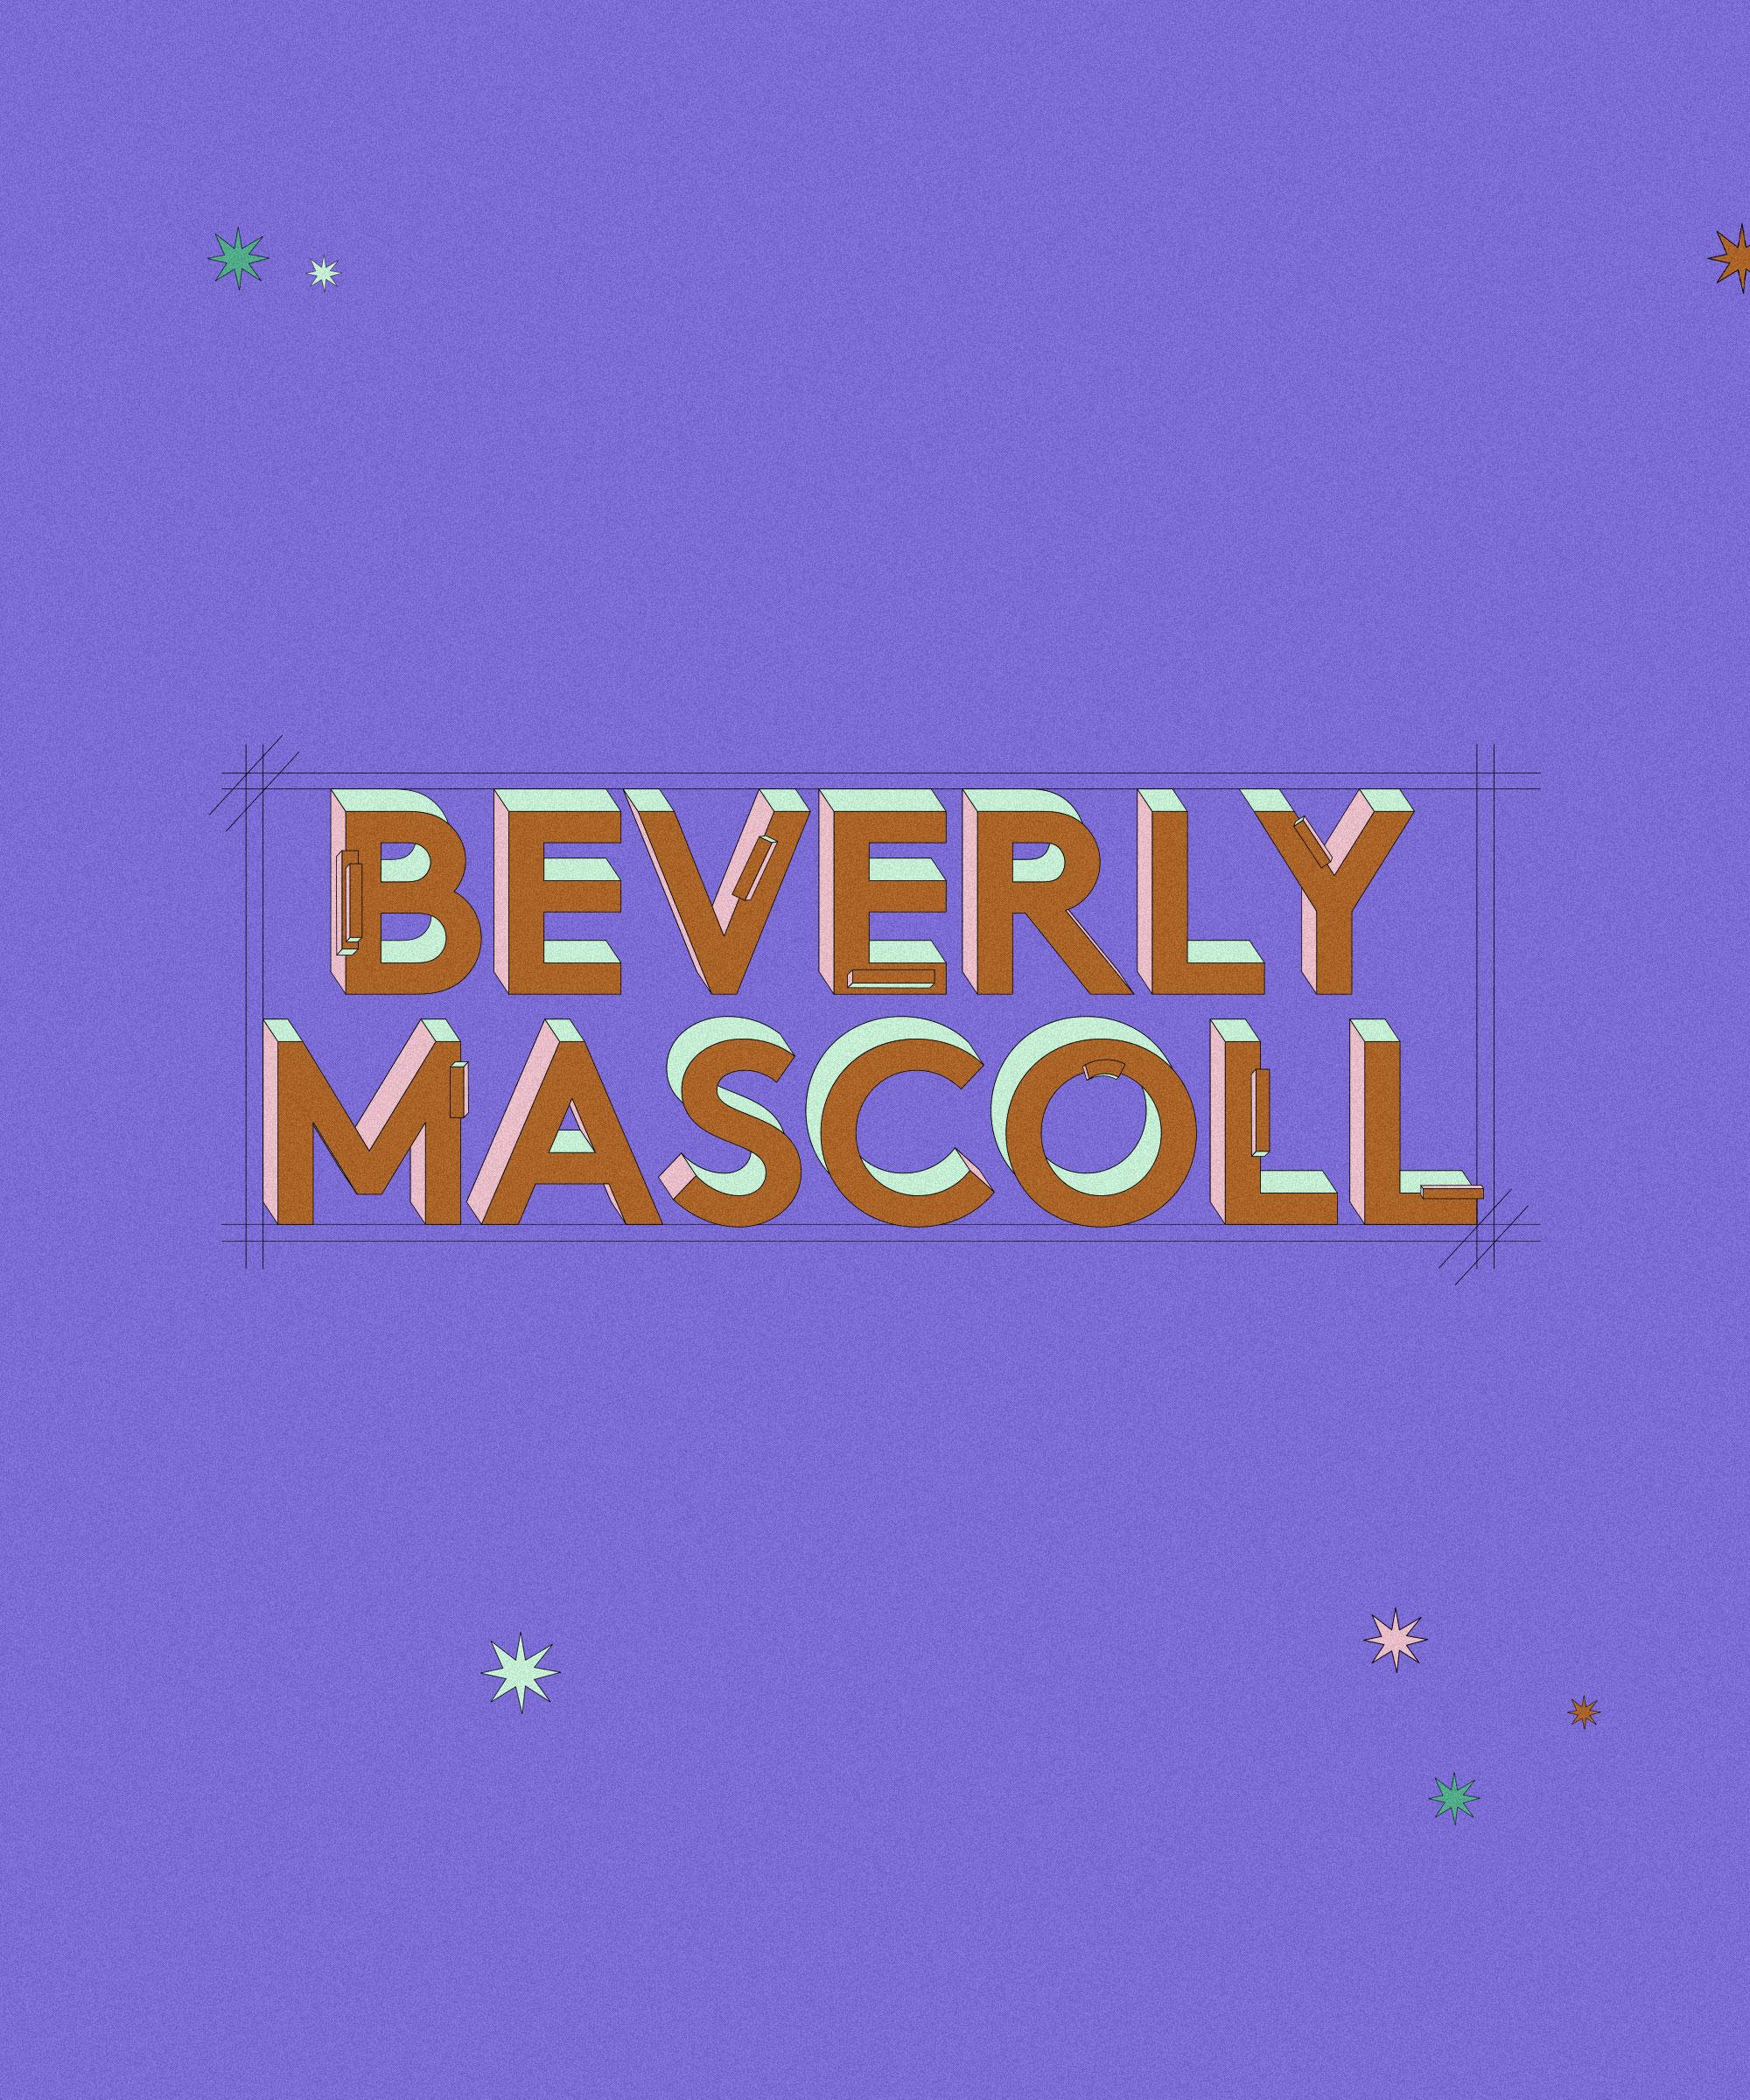 RCA_Butcher-Yazmin_BlackHistoryMonthNames_02012019_Slideshow_BeverlyMascoll01.jpg